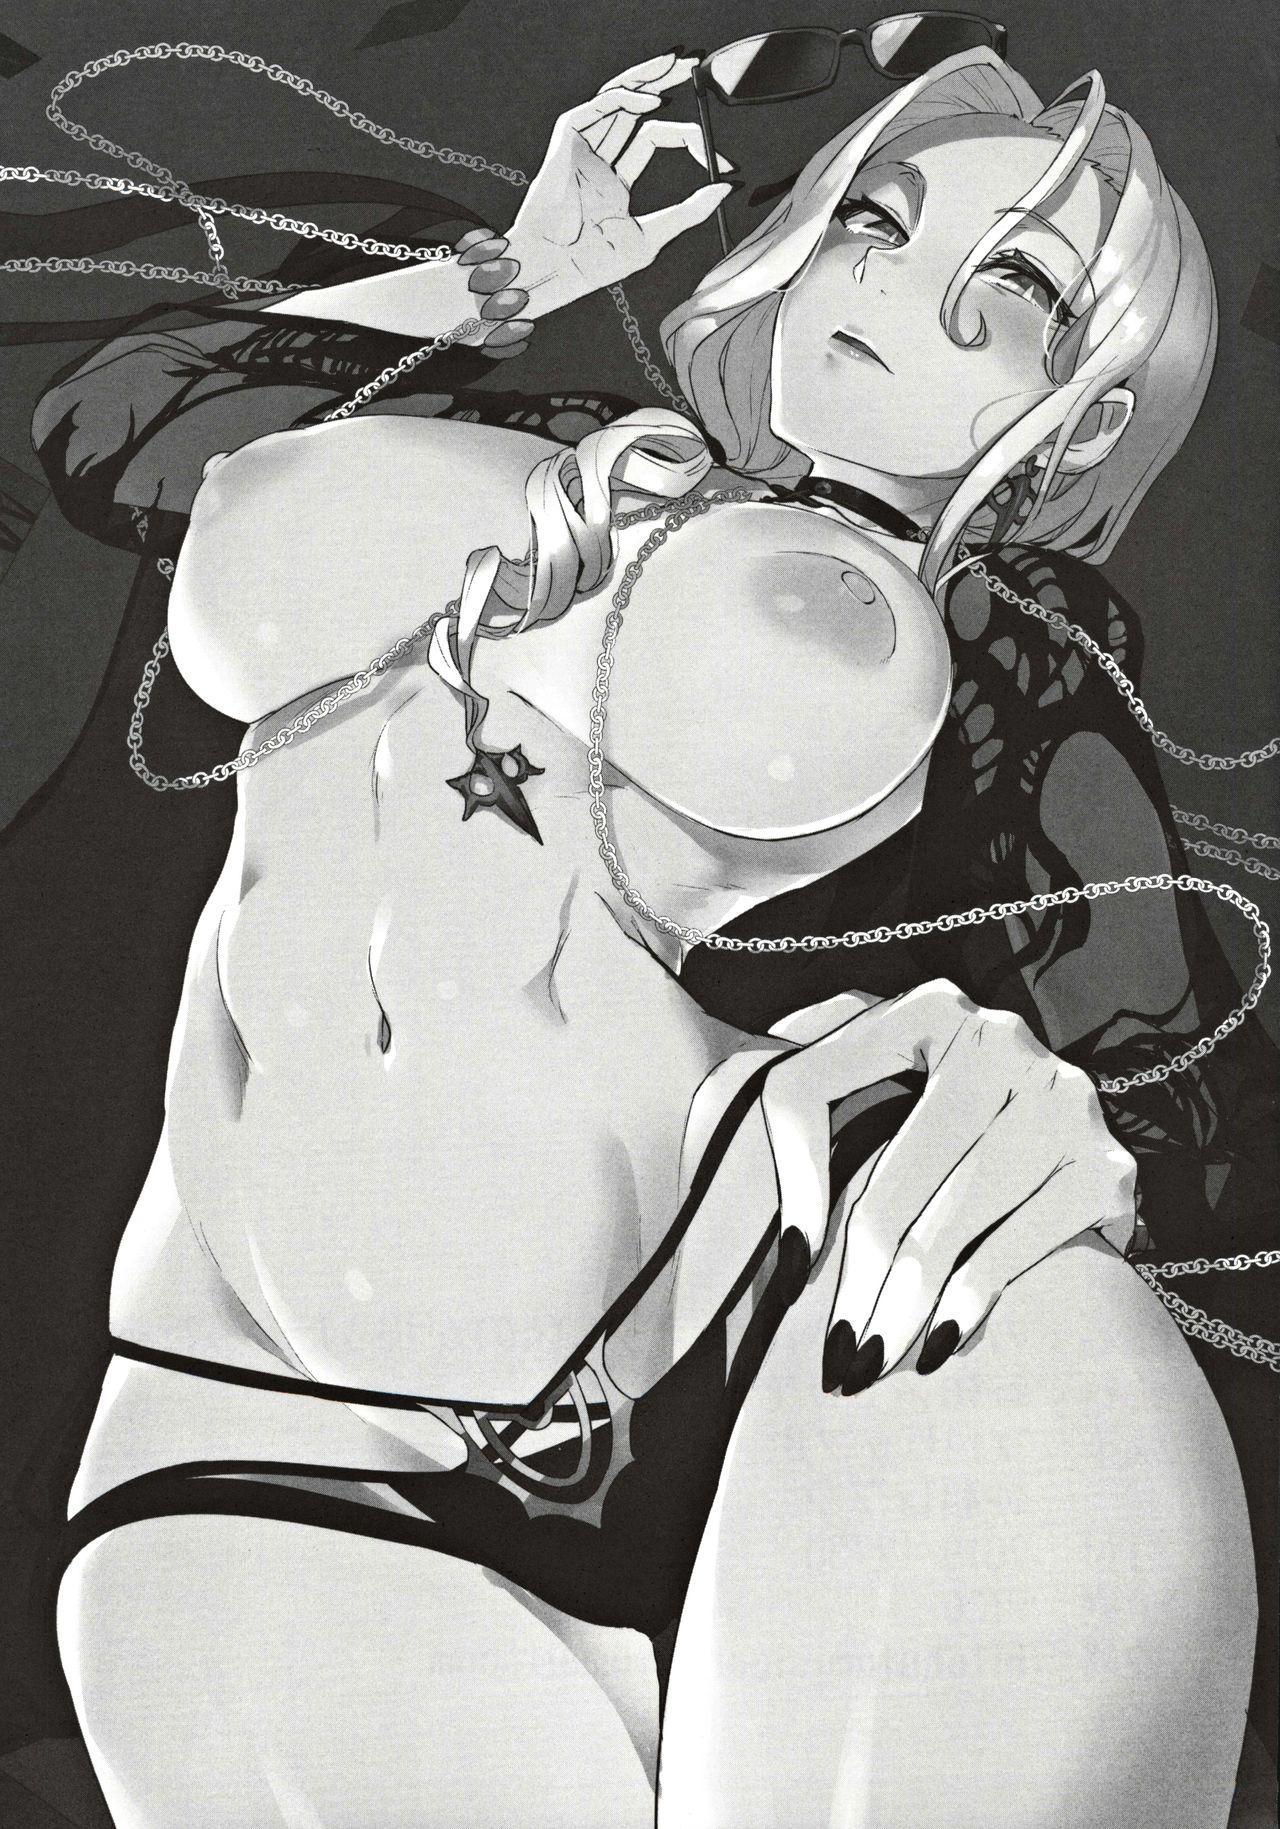 Carmilla-san no Ecchi na no ga Kakitakatta Hon 27